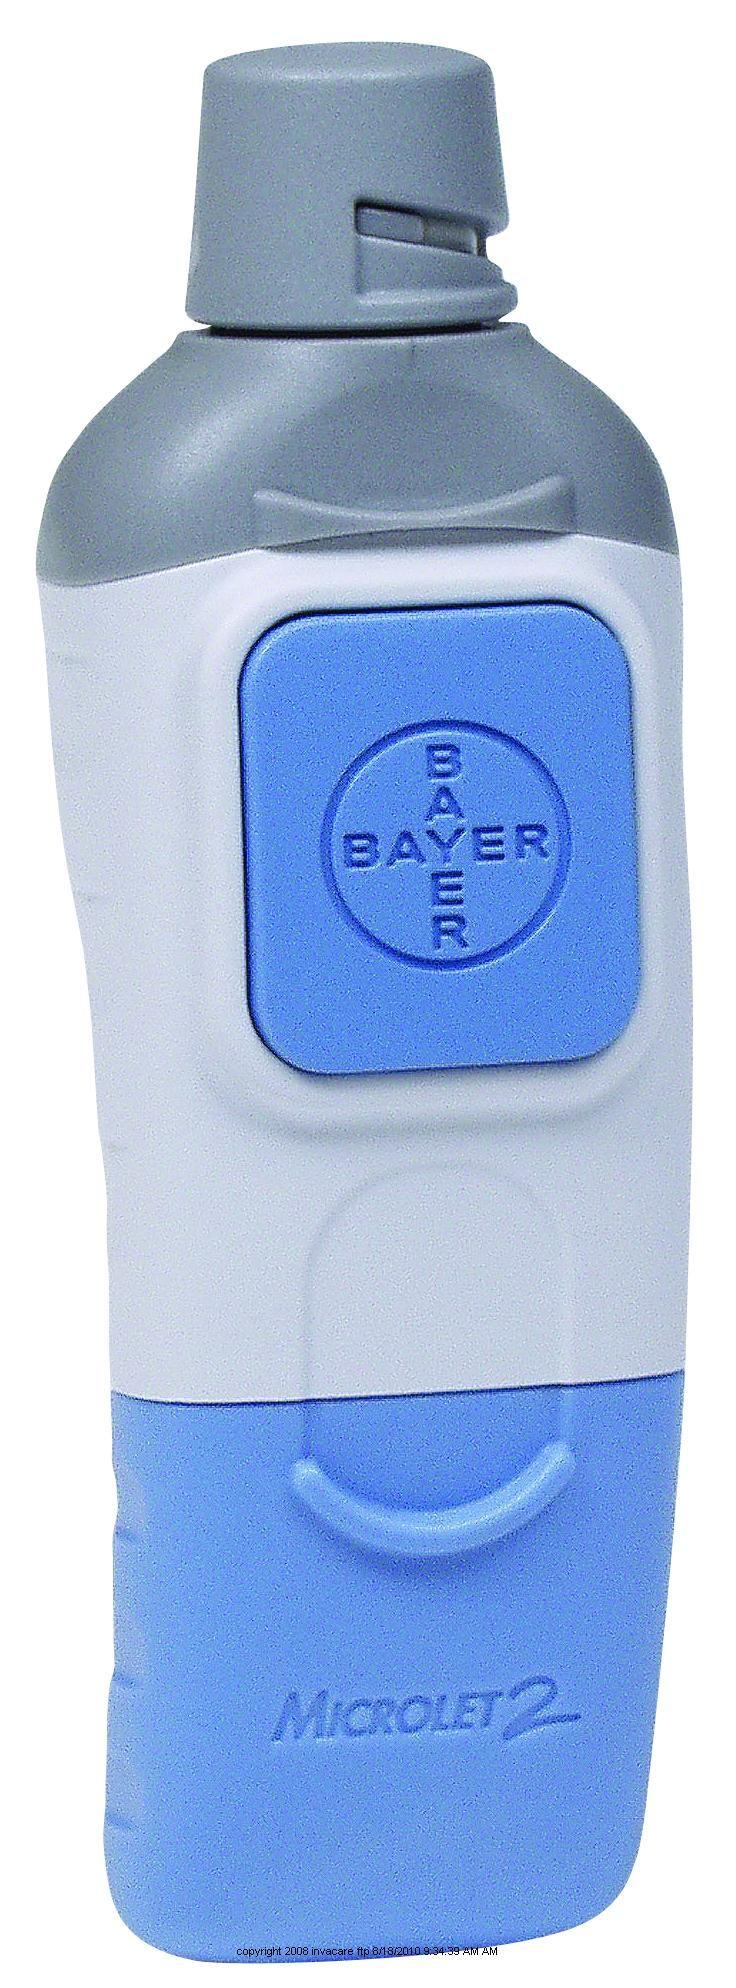 Bayer Microlet 2 Adjustable Lancing Device Lancing